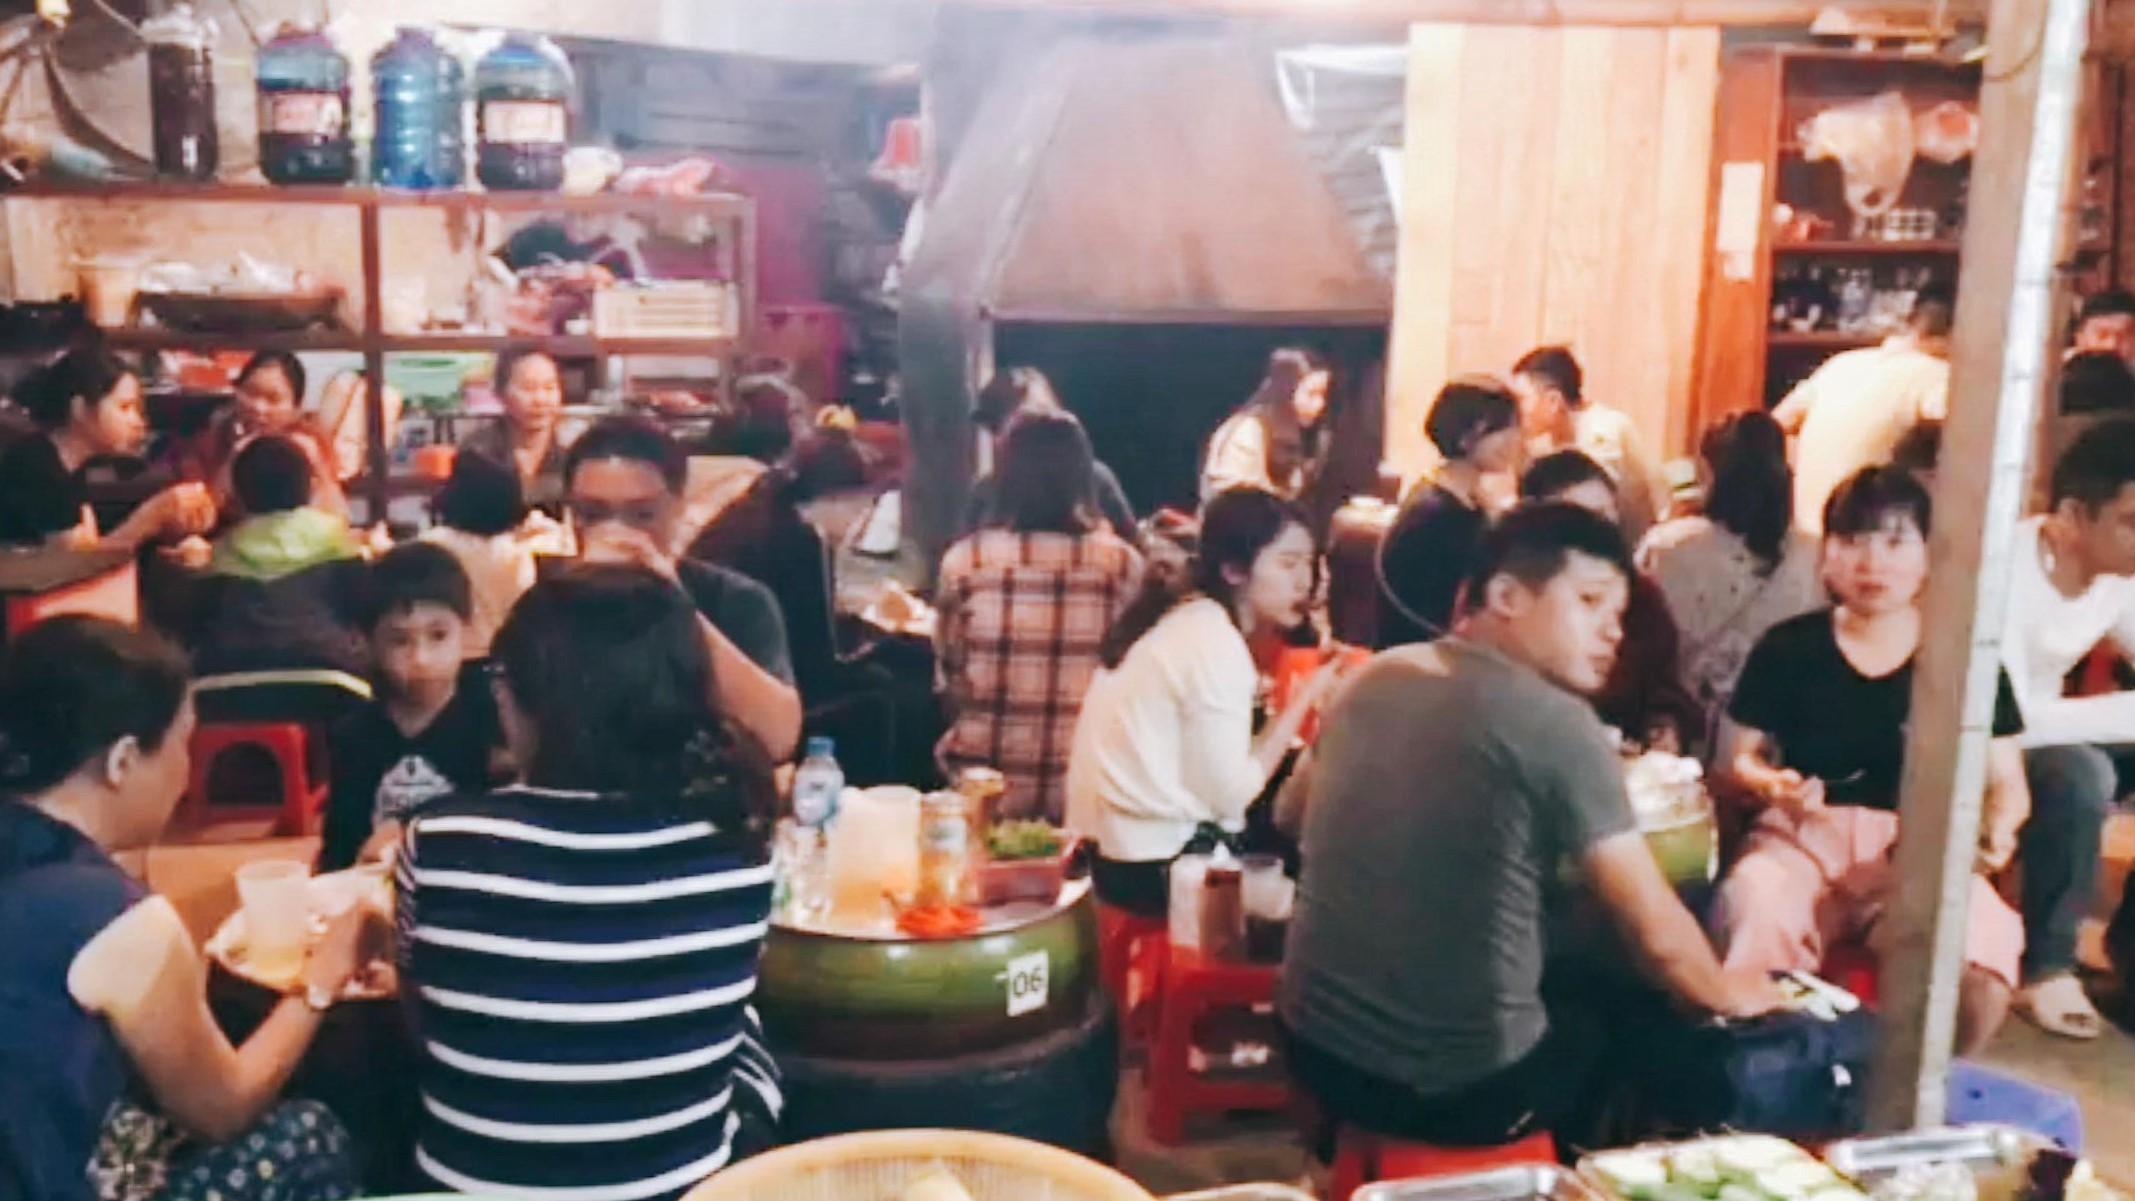 Quan Nuong 04 Hoang Lien Sapa